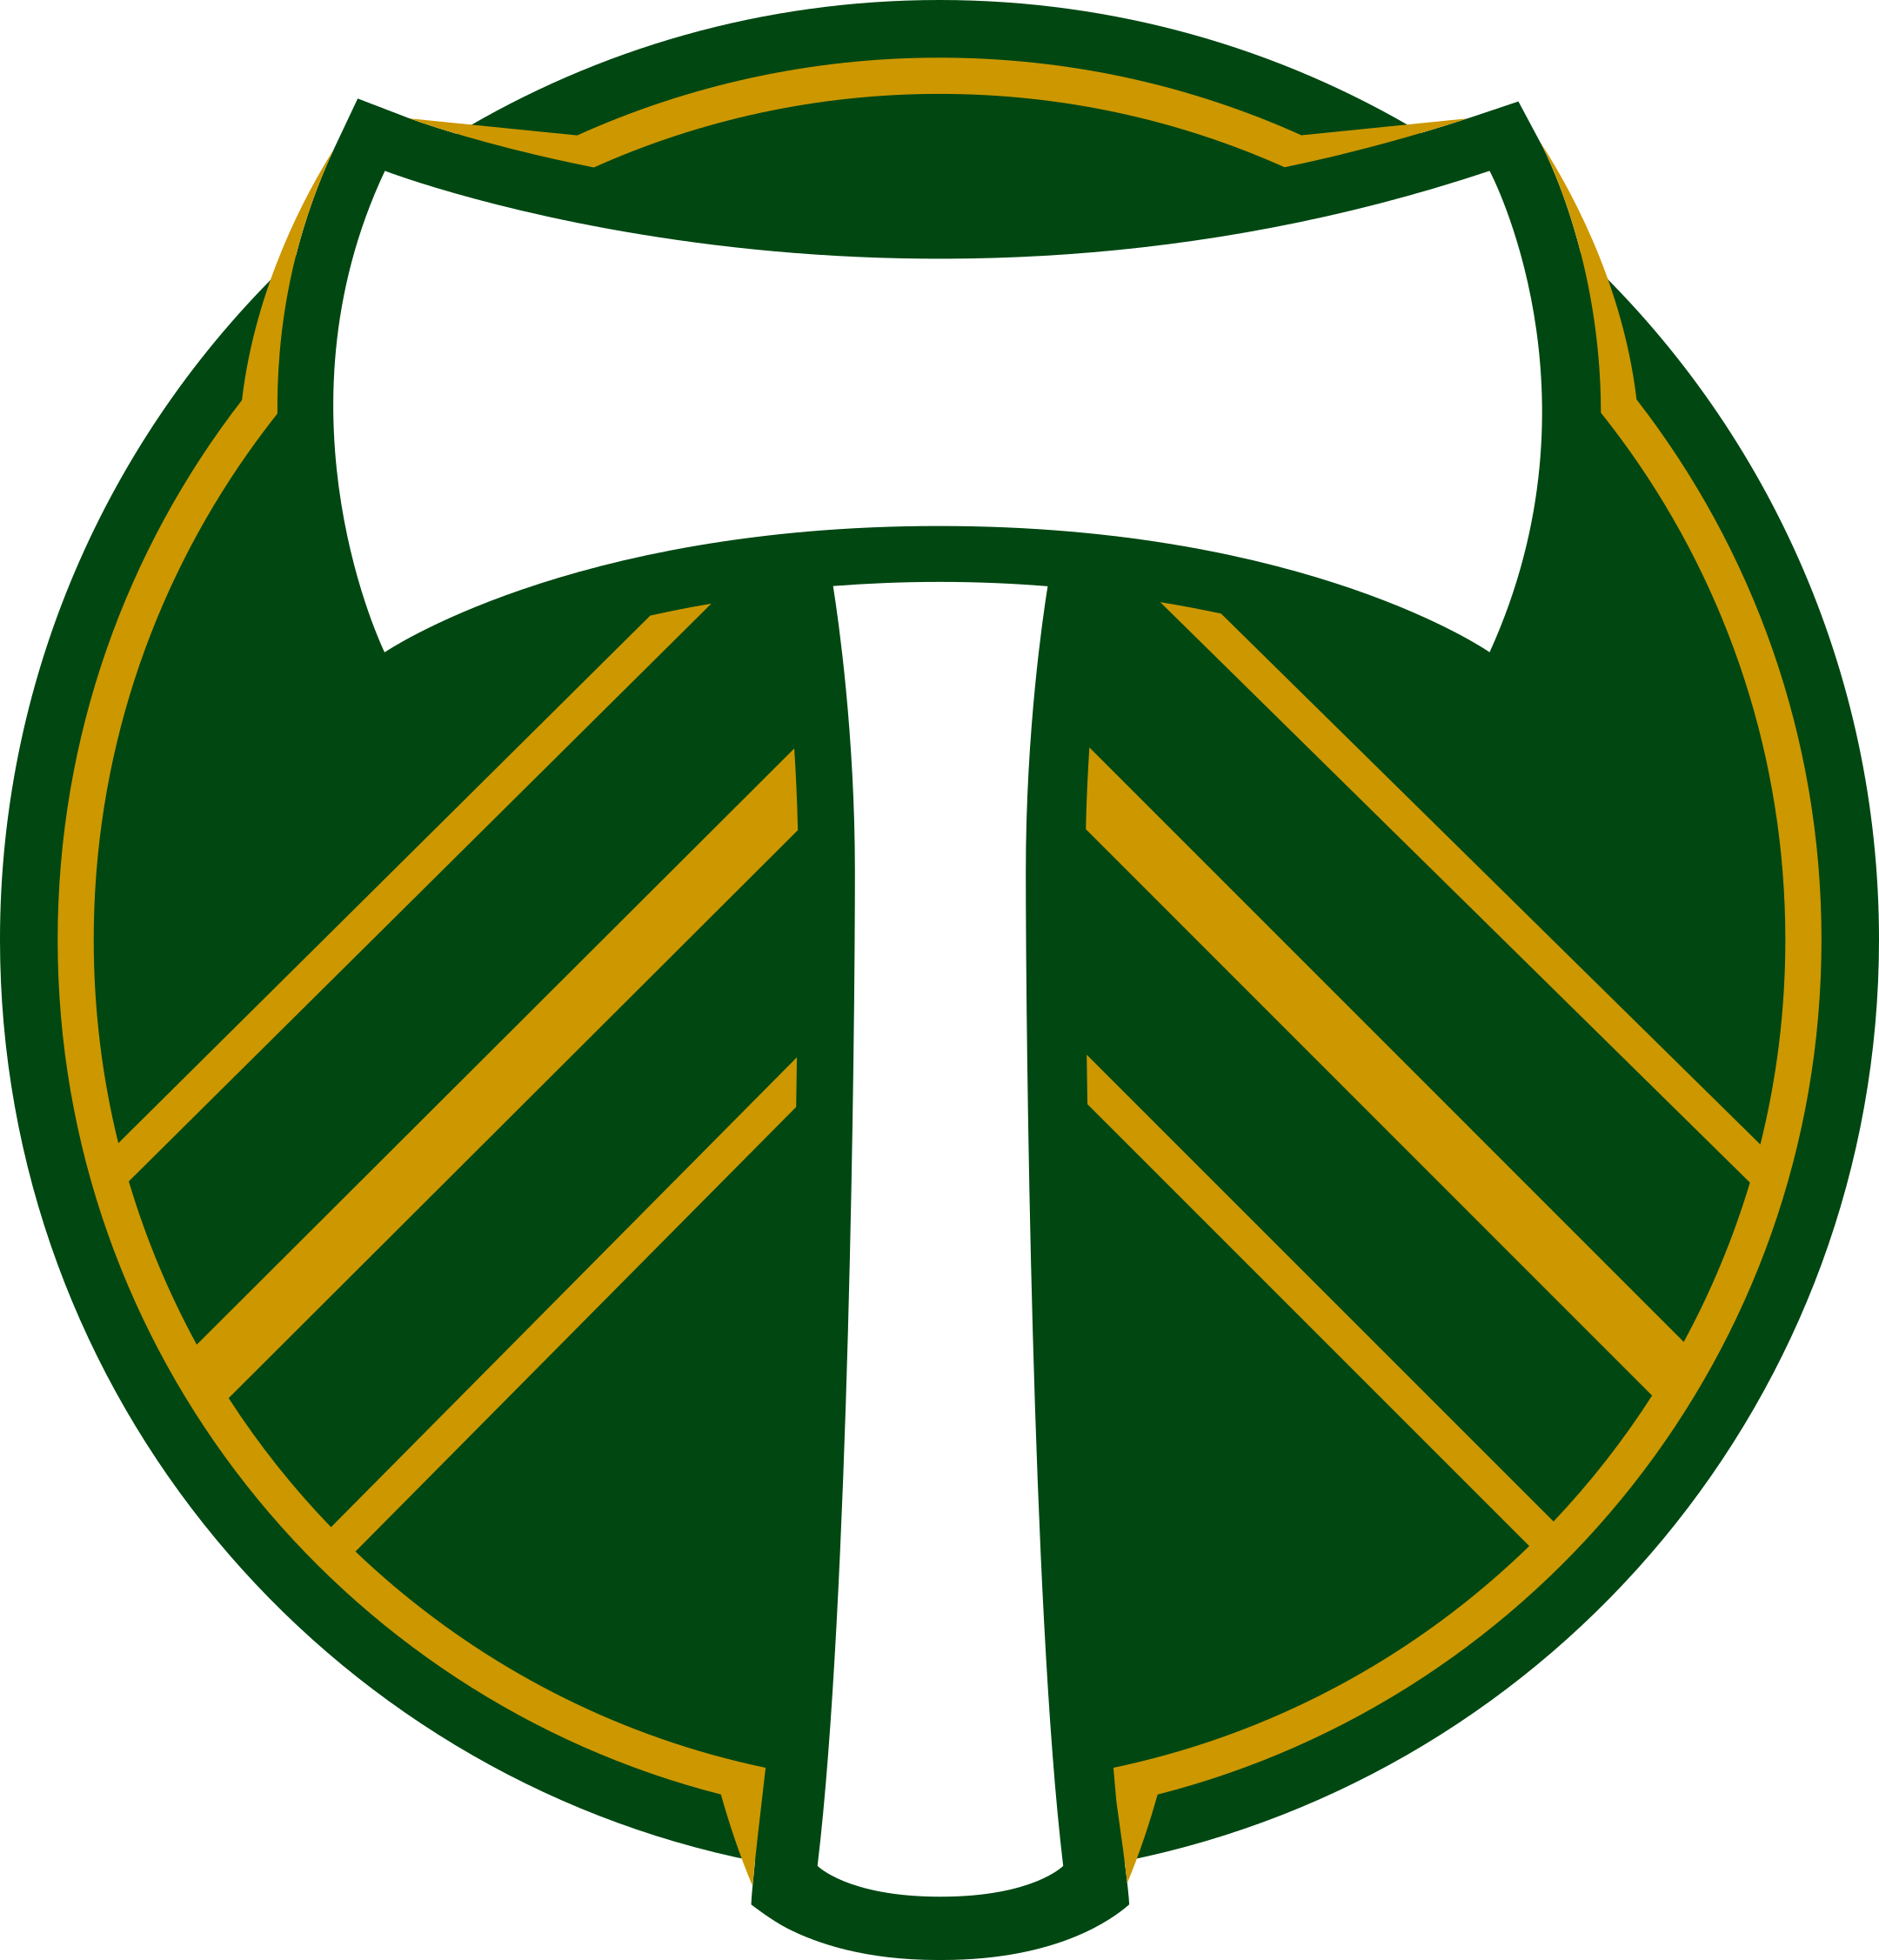 portland timbers logo 1 - Portland Timbers Logo